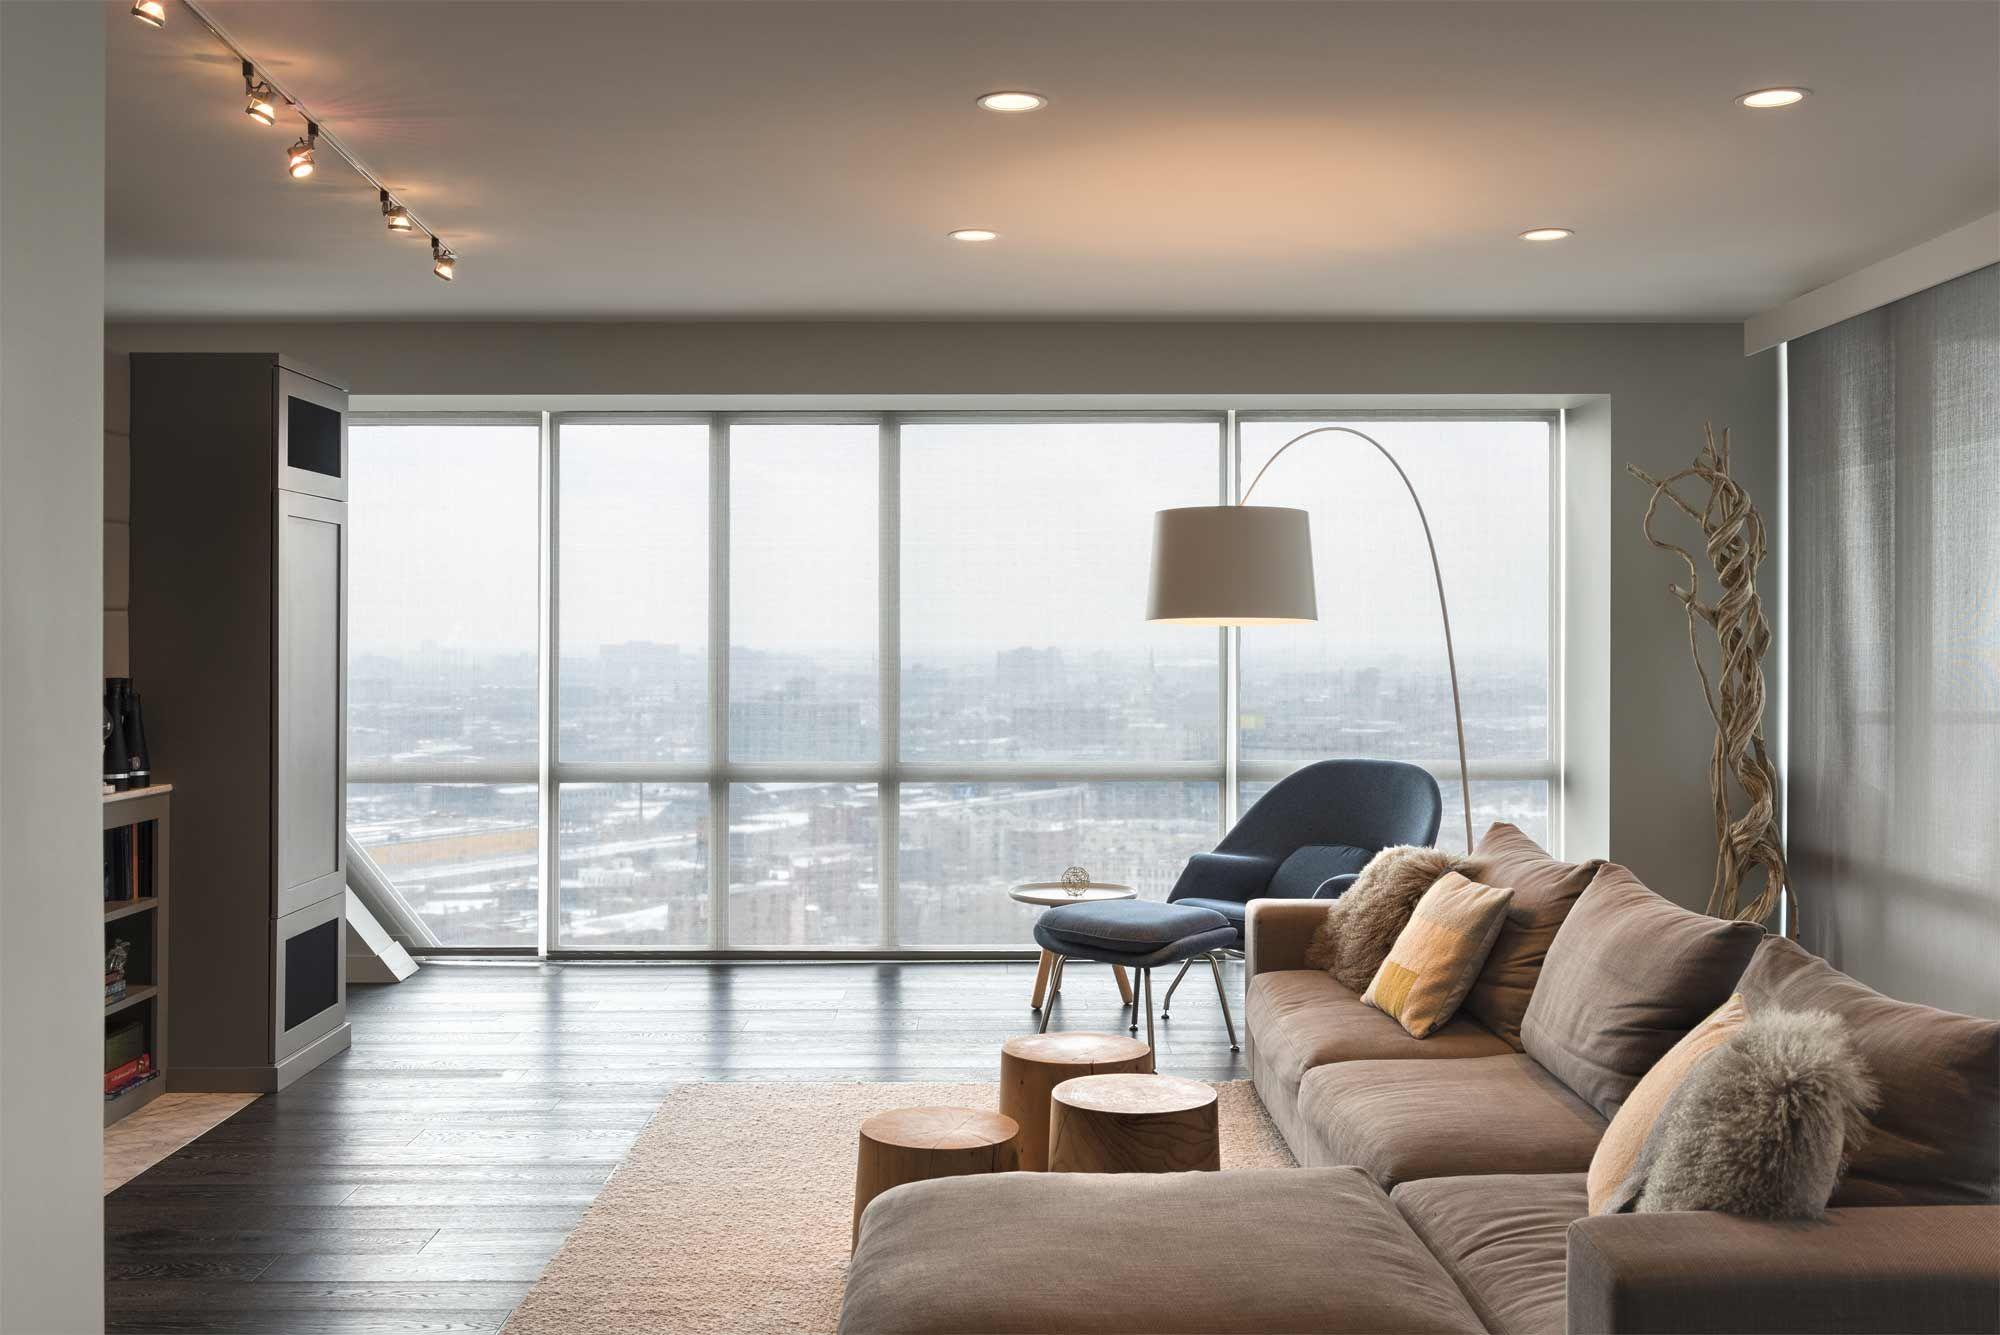 Twiggy Floor Lamp By Foscarini Designer Credit Sk